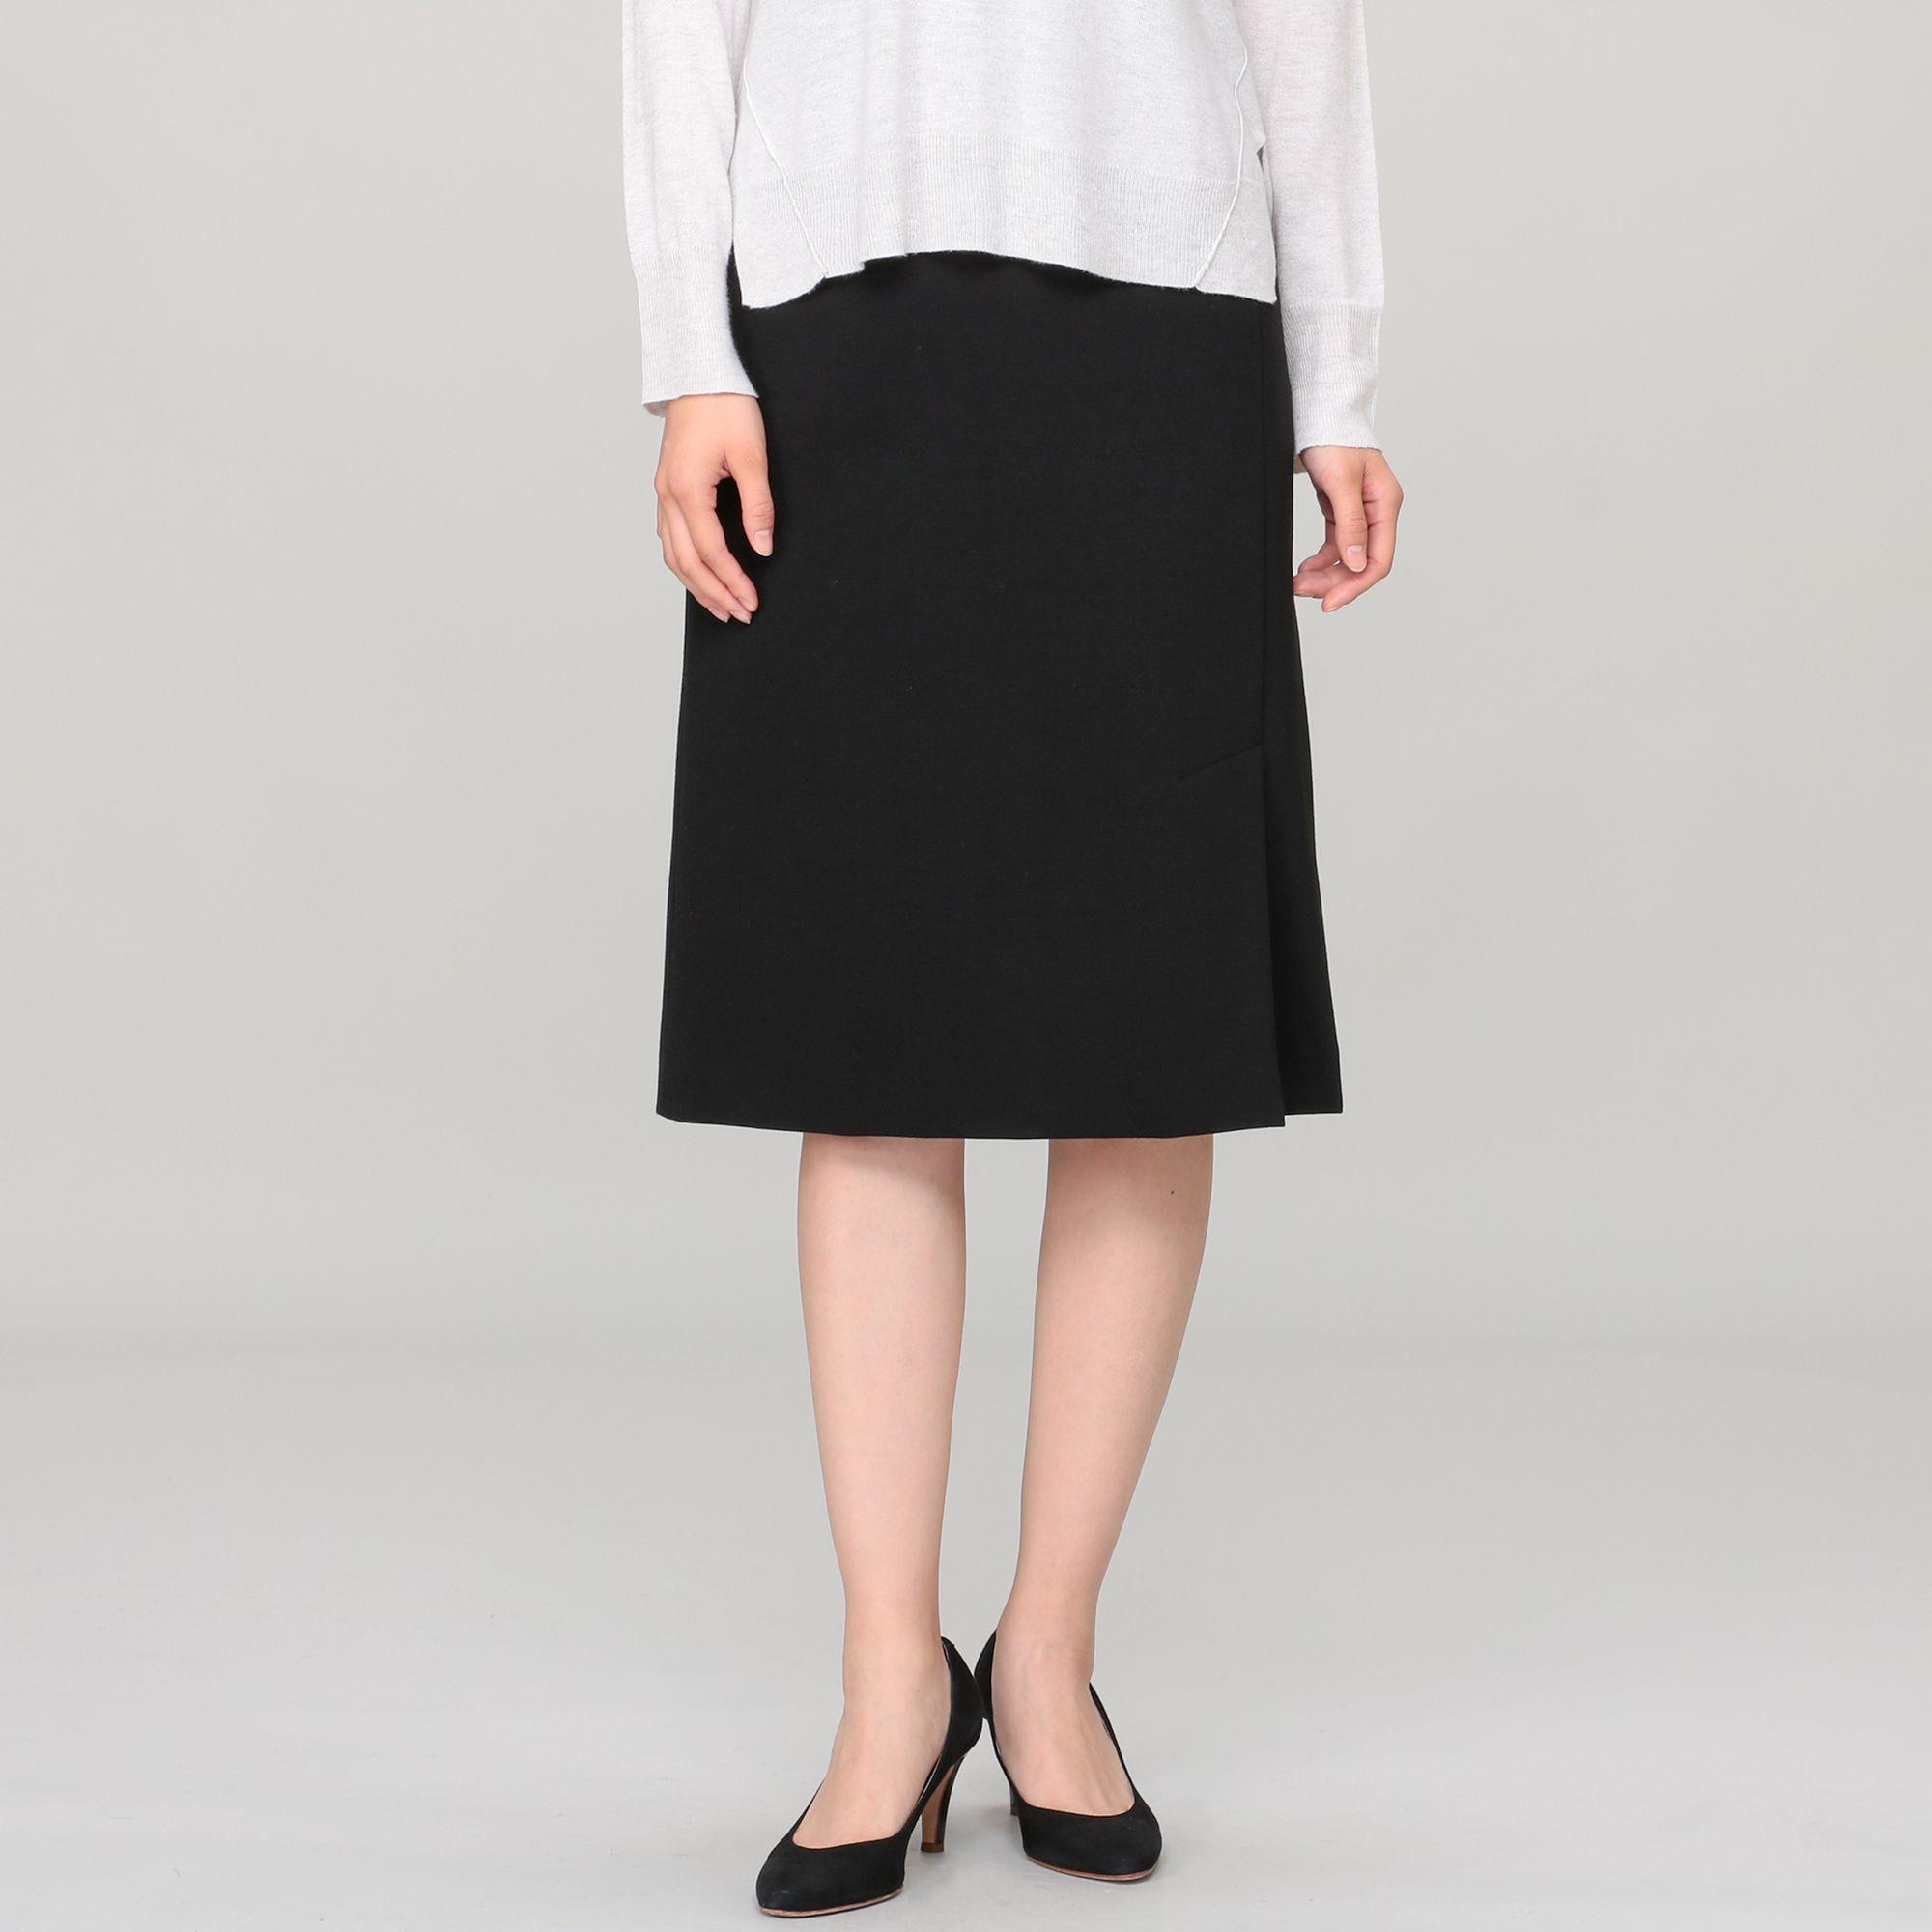 M・filエムフィル/ポンチタイトスカート